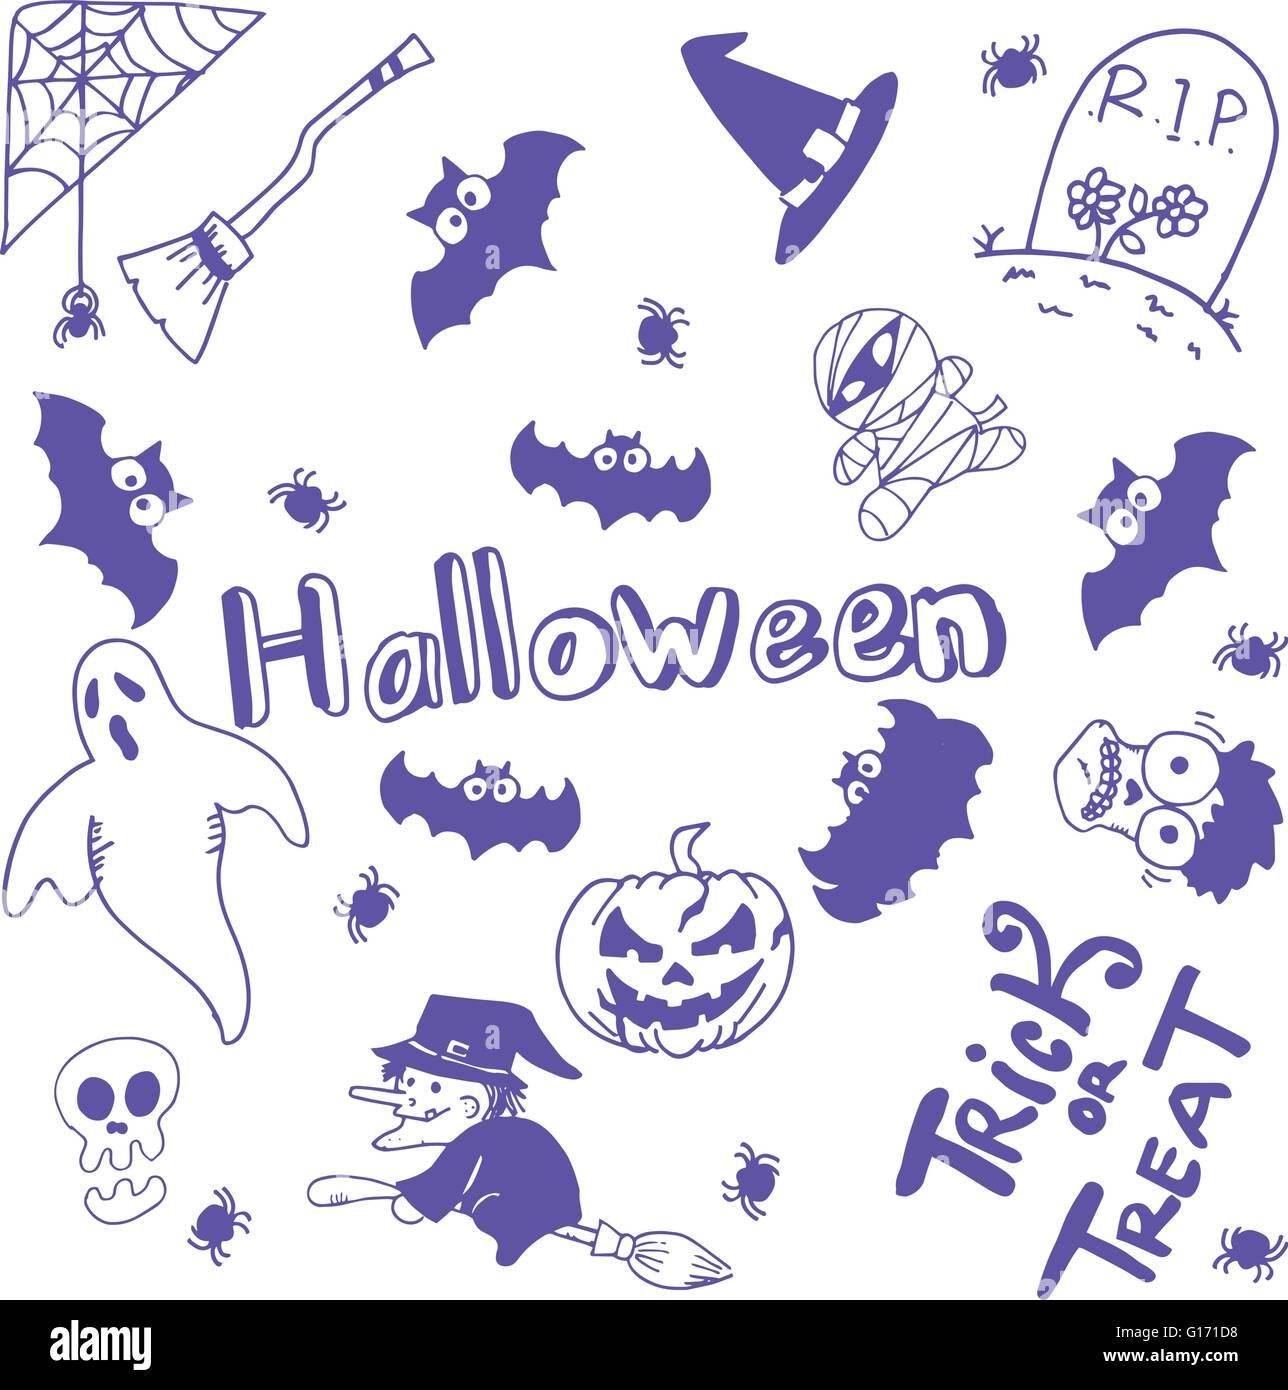 Halloween Characters Doodle Art